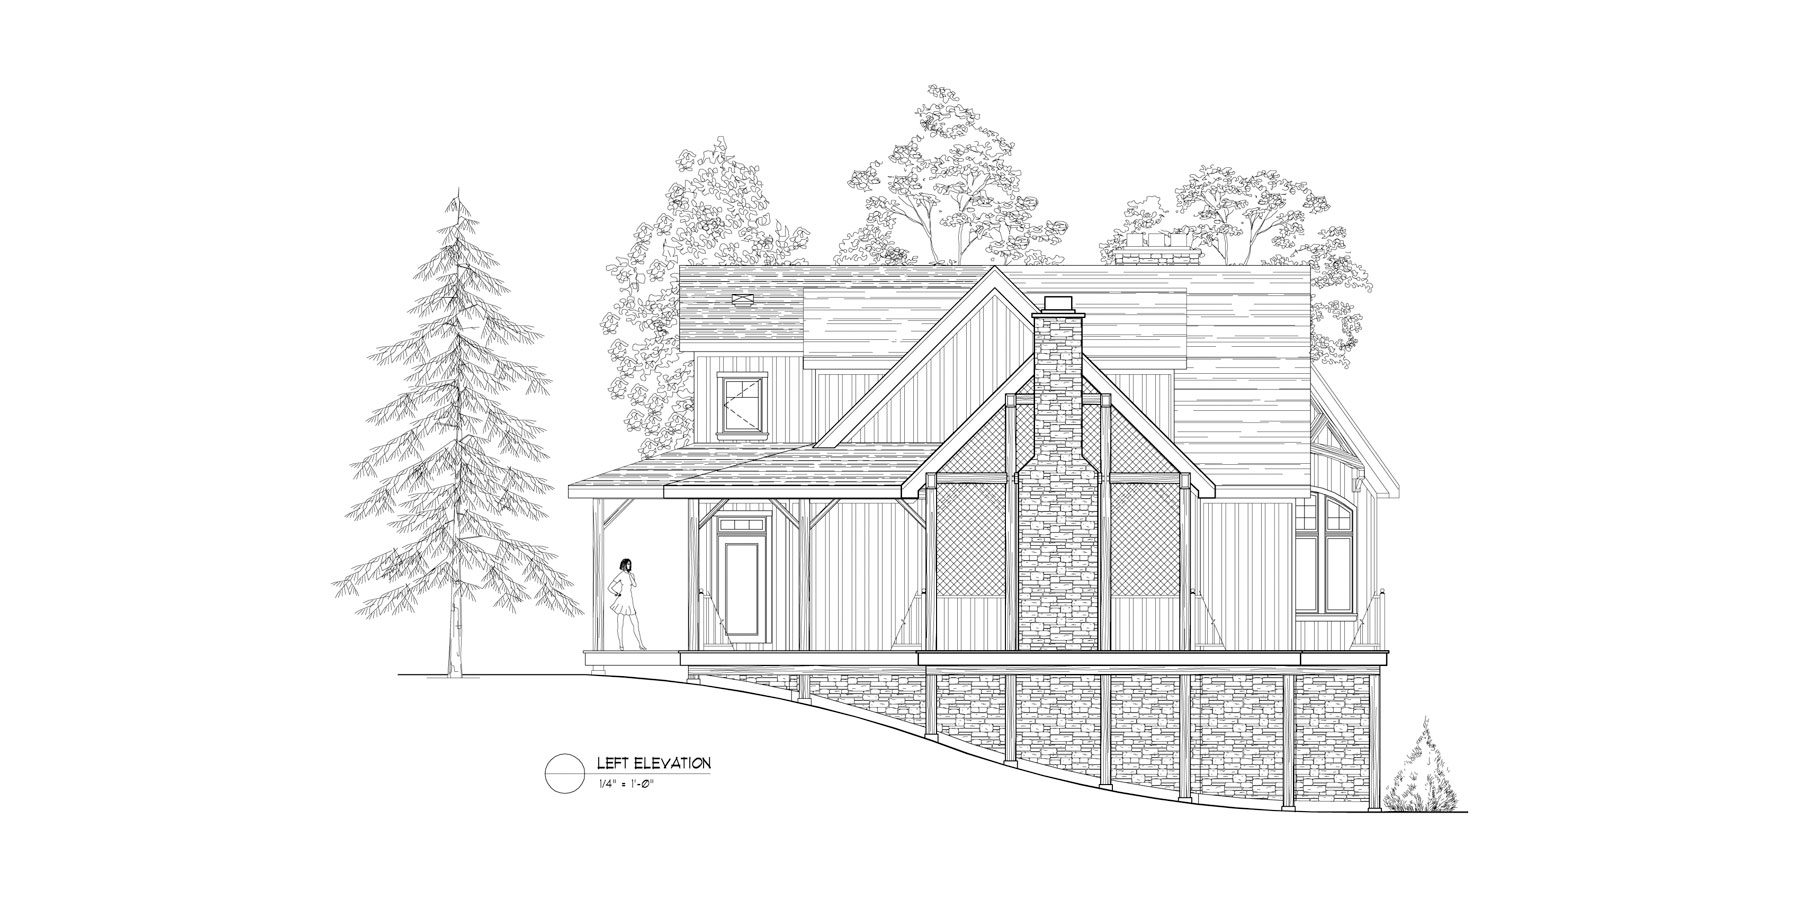 Normerica Timber Frames, House Plan, The Fremont 3582, Left Elevation